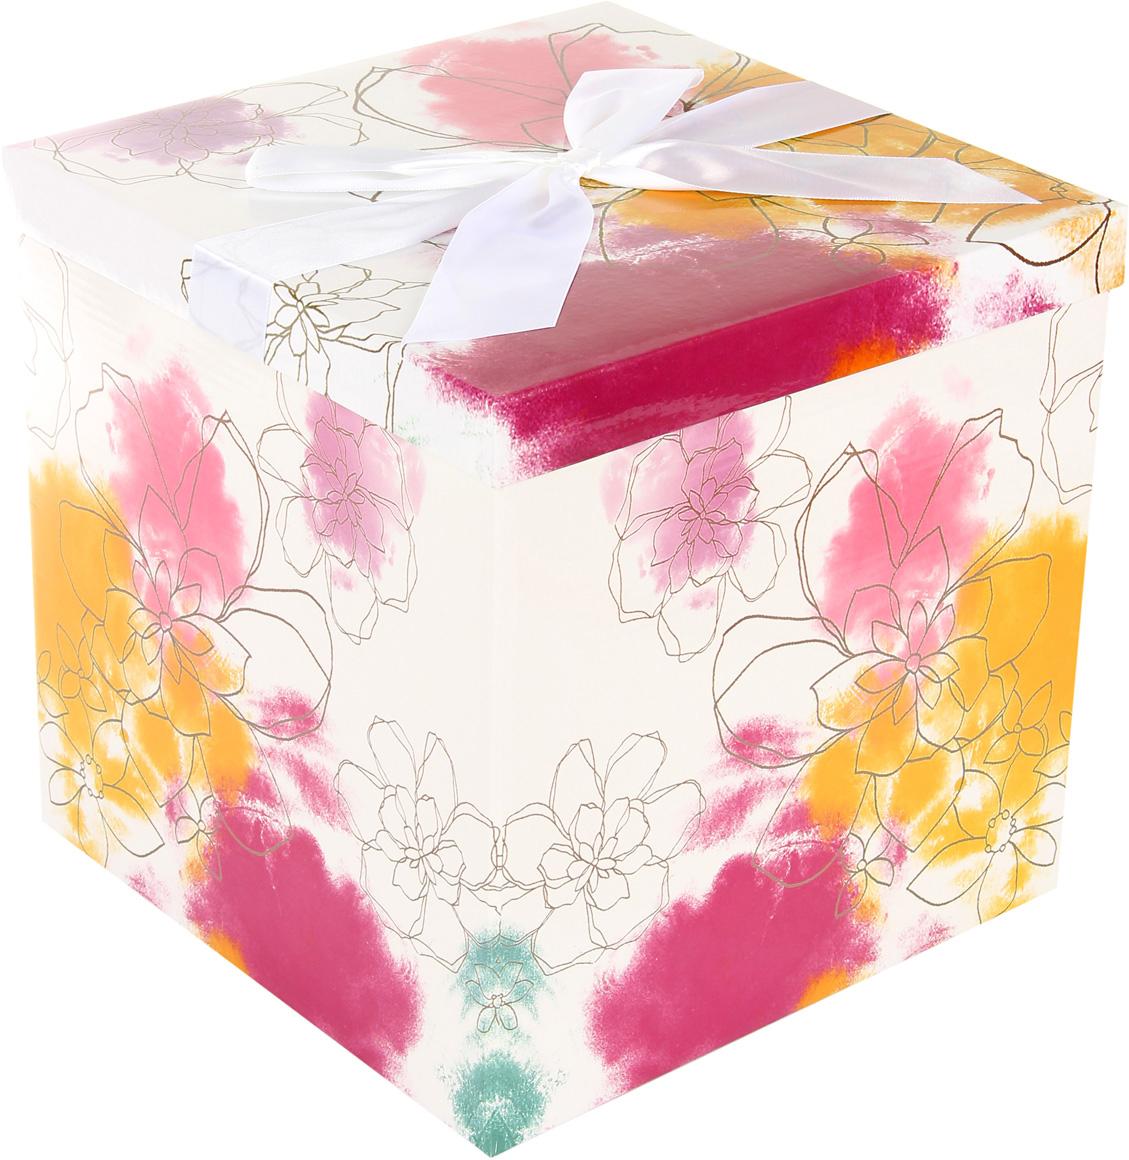 Коробка подарочная Veld-Co Giftbox. Трансформер. Акварель, цвет: белый, 25,5 х 25,5 х 25 см коробка подарочная veld co giftbox трансформер цветные колечки цвет белый 25 5 х 25 5 х 25 см